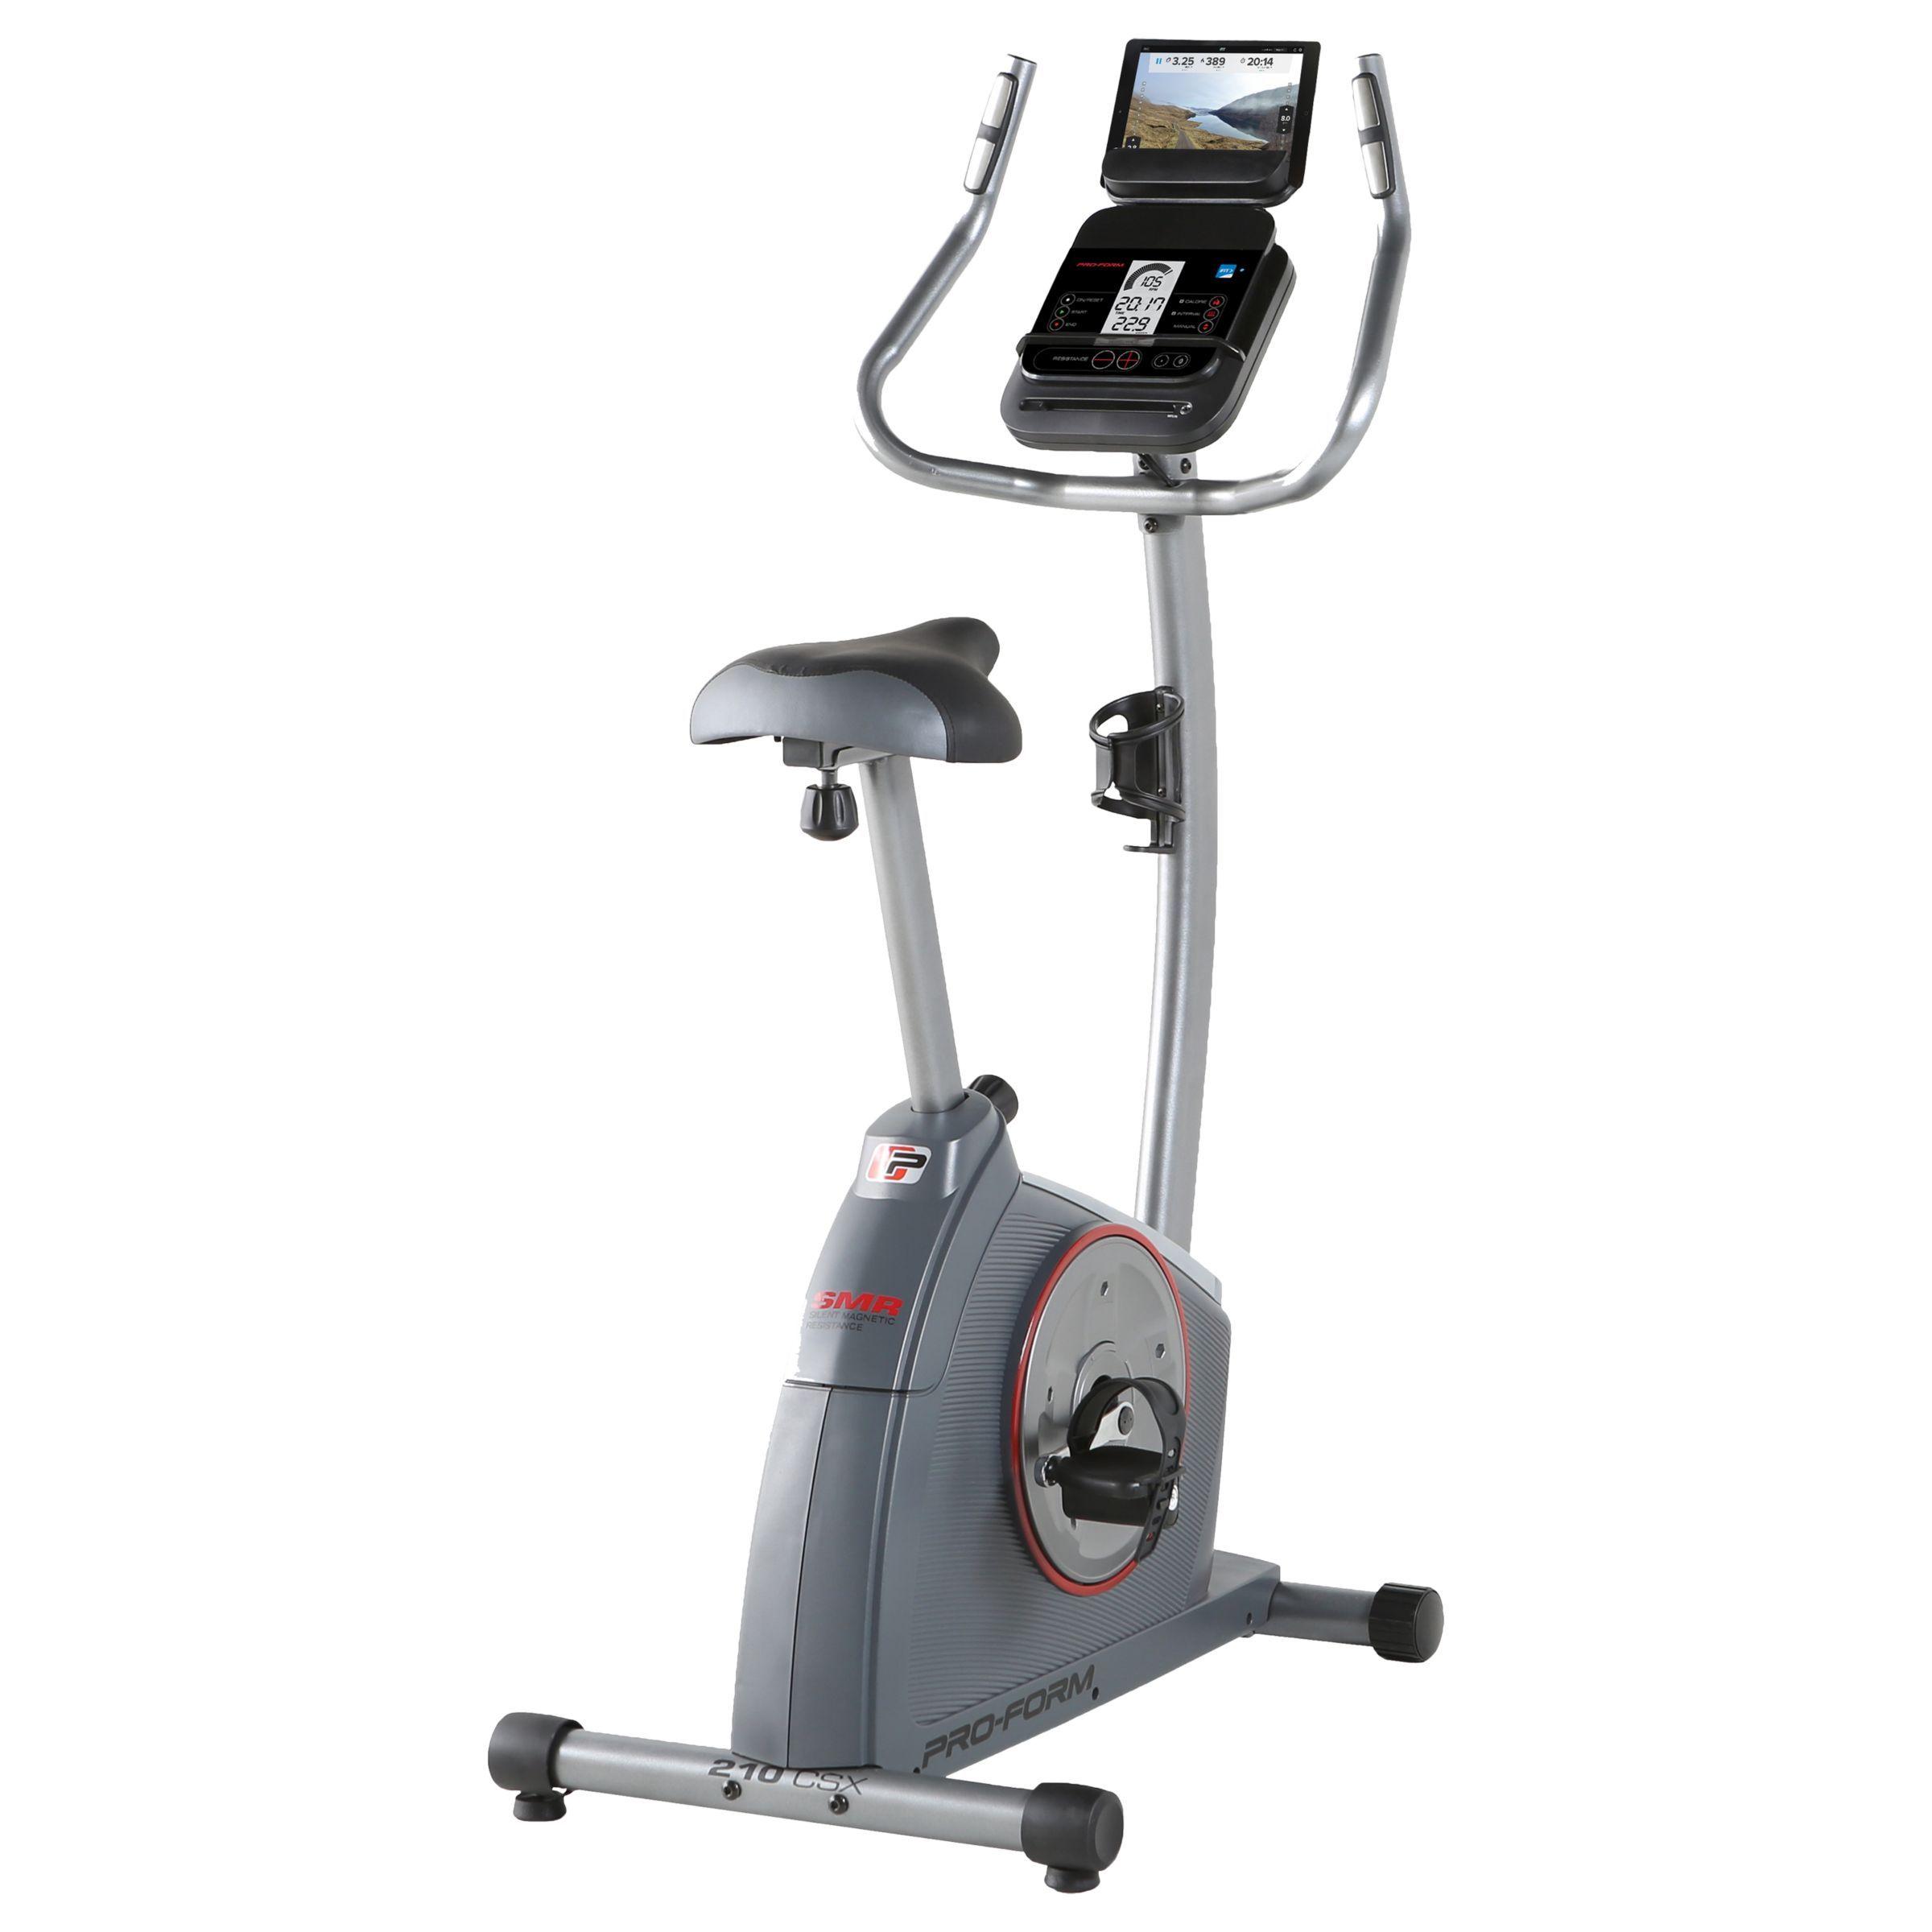 Proform 210 Csx Exercise Bike Recumbent Bike Workout Bike Exercise